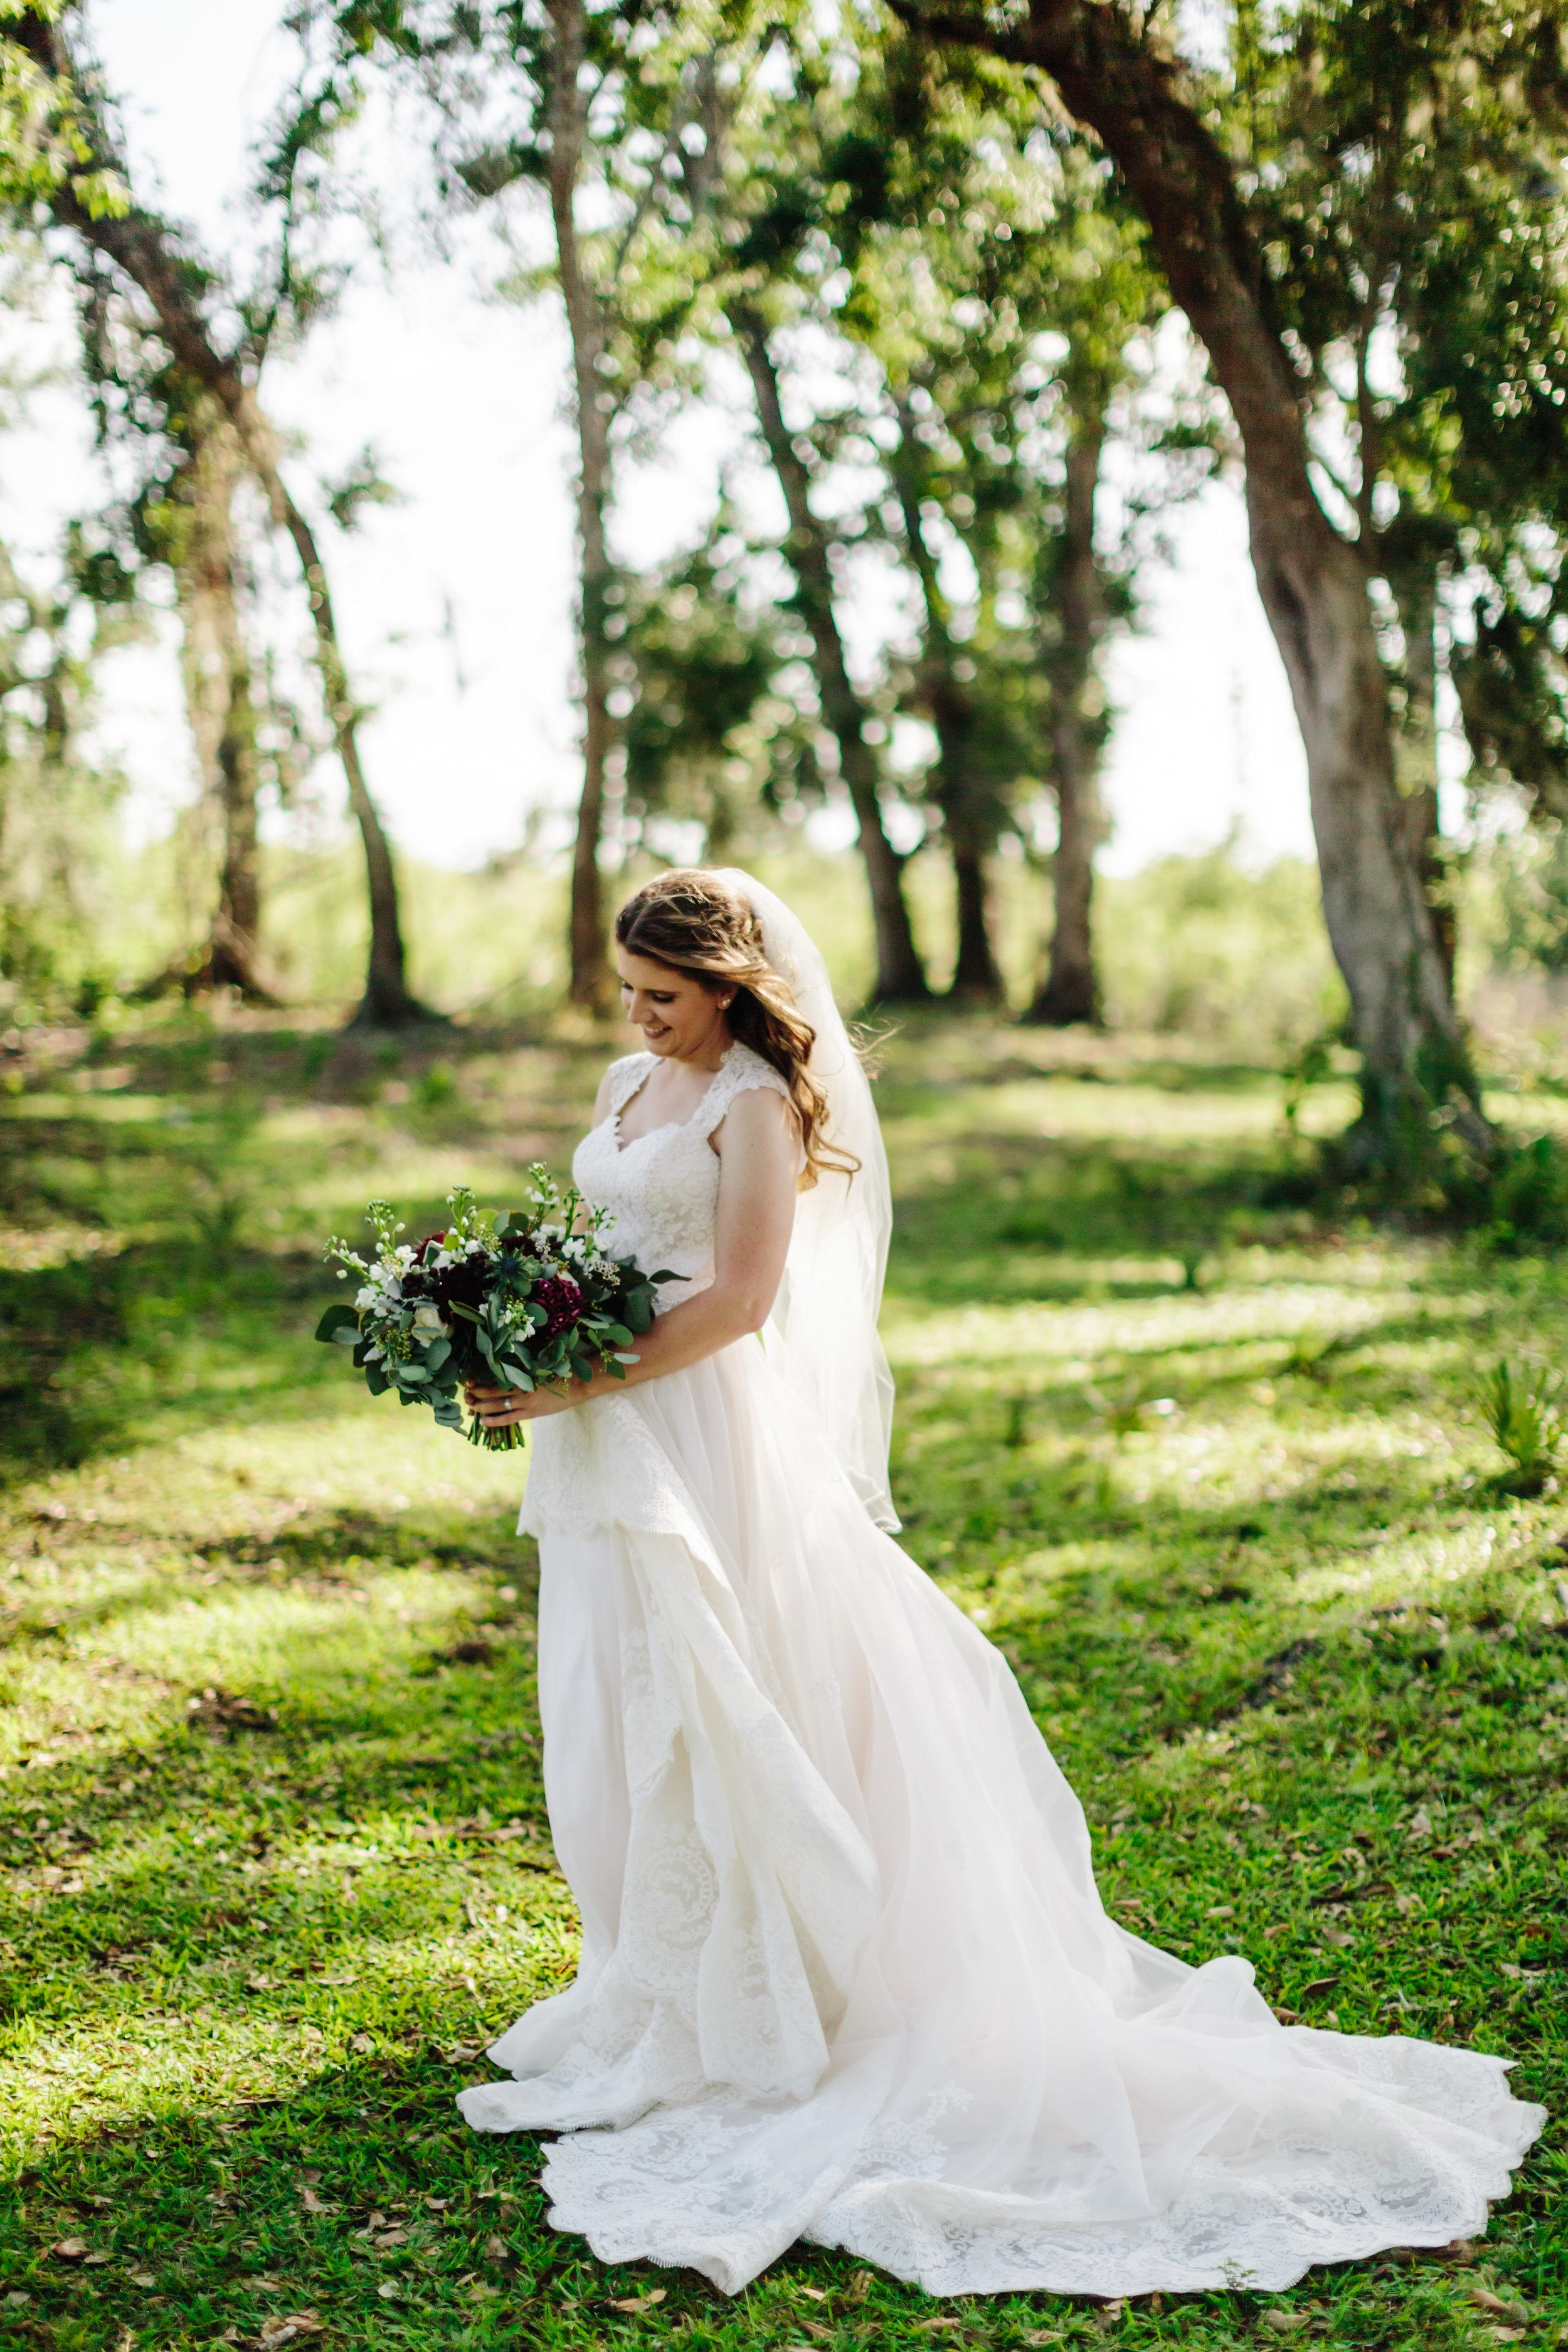 2018.04.14 Zak and Jamisyn Unrue Black Willow Barn Wedding Finals-587.jpg